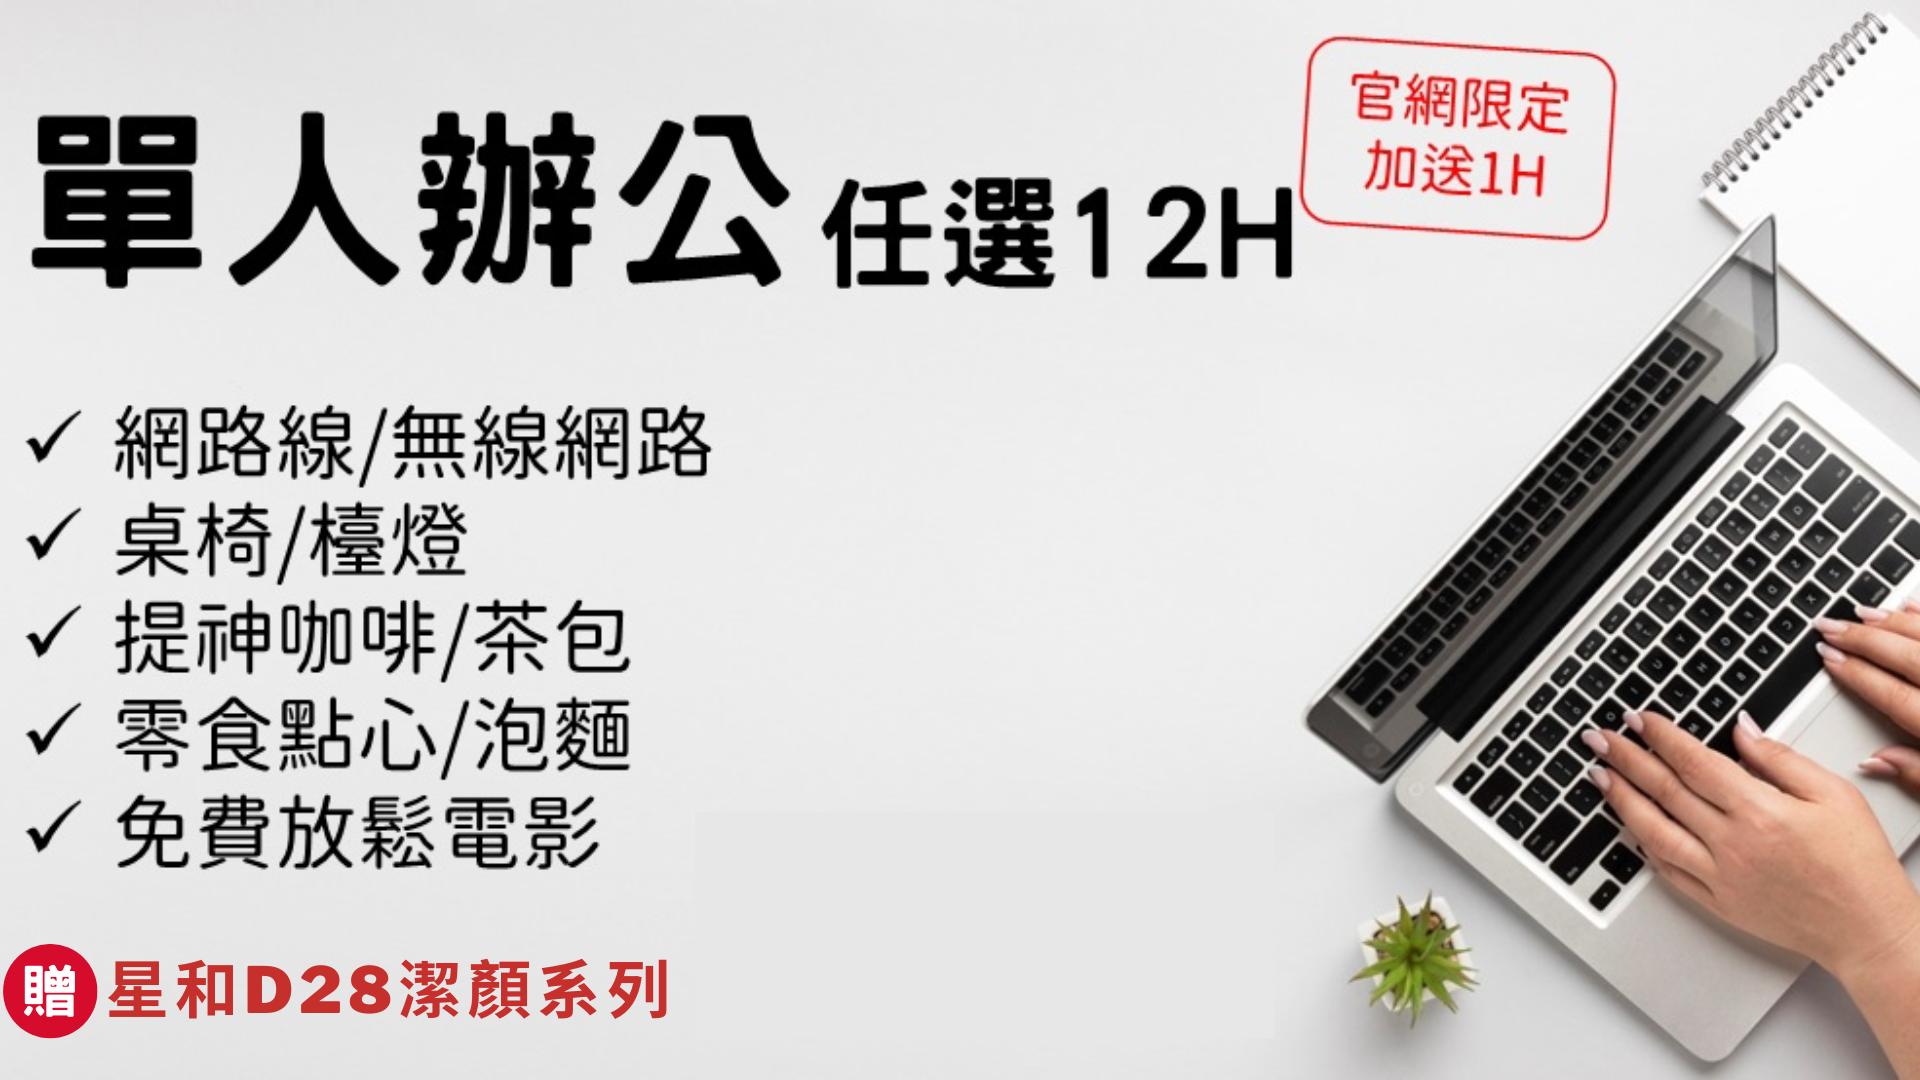 https://booking.taipeiinngroup.com/nv/images/suite/747_108thumb.jpg